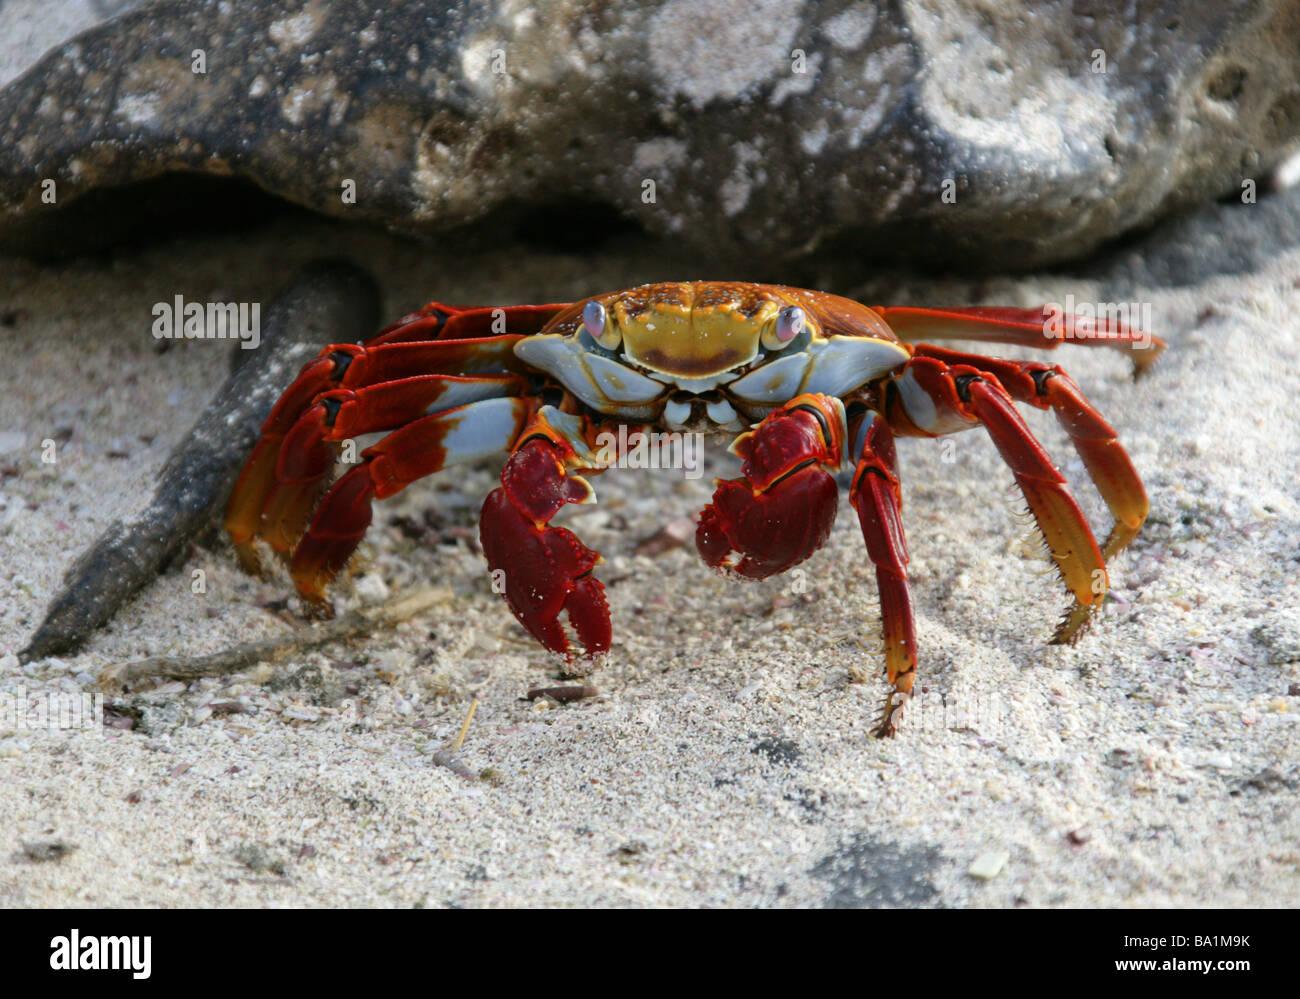 Sally Lightfoot Crab, Grapsus grapsus, Espanola Island, Galapagos Islands, Ecuador, South America - Stock Image